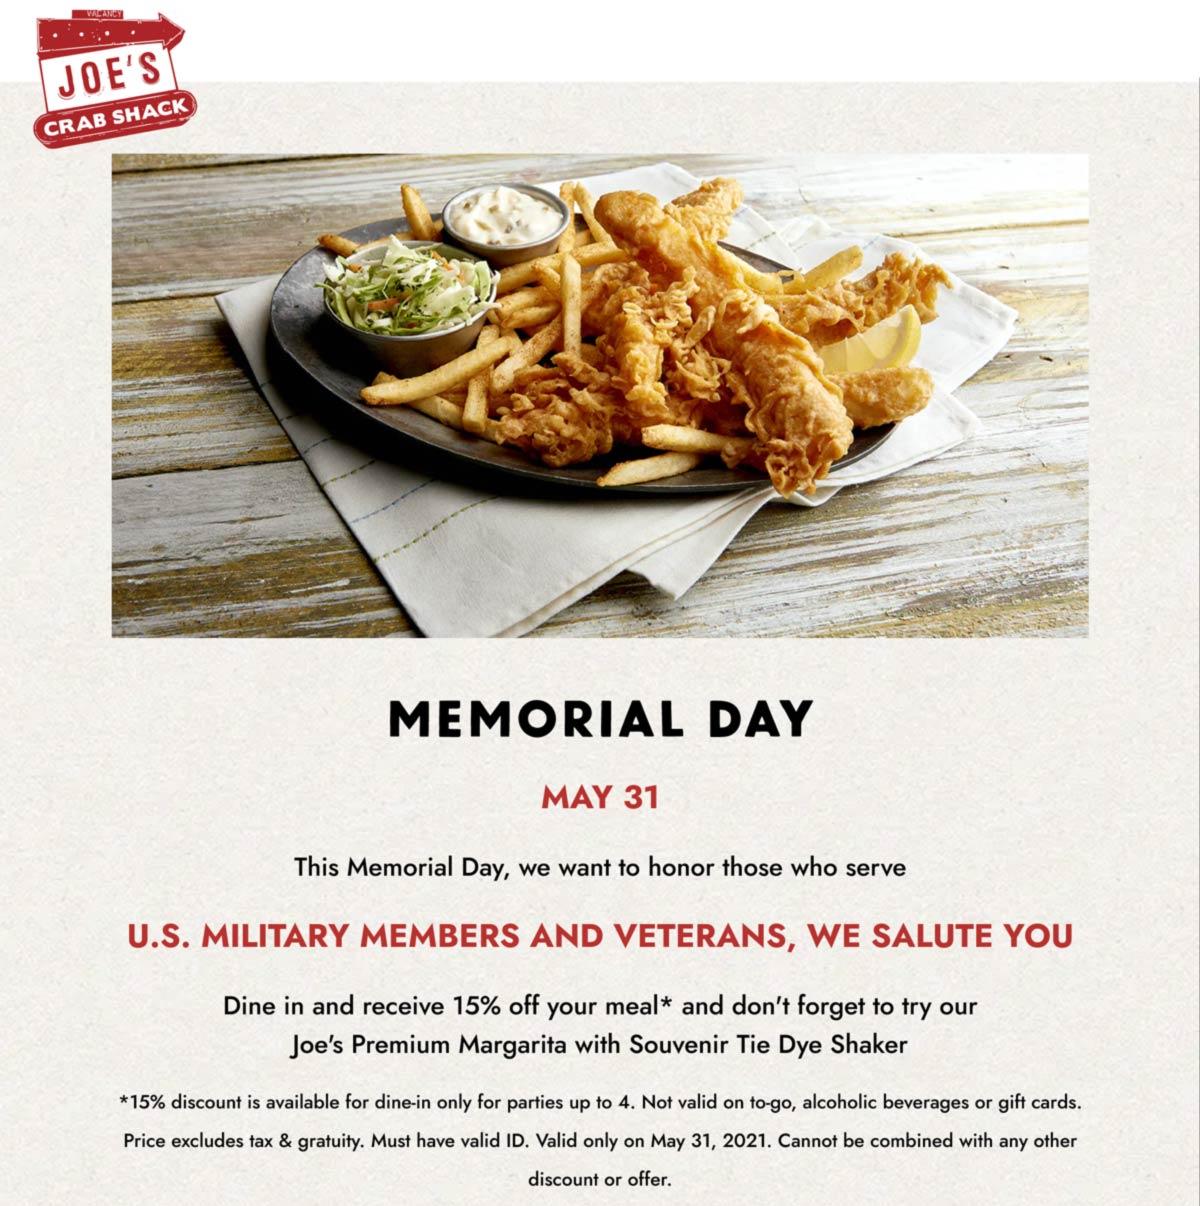 Joes Crab Shack restaurants Coupon  Military & veterans enjoy 15% off Monday at Joes Crab Shack restaurants #joescrabshack